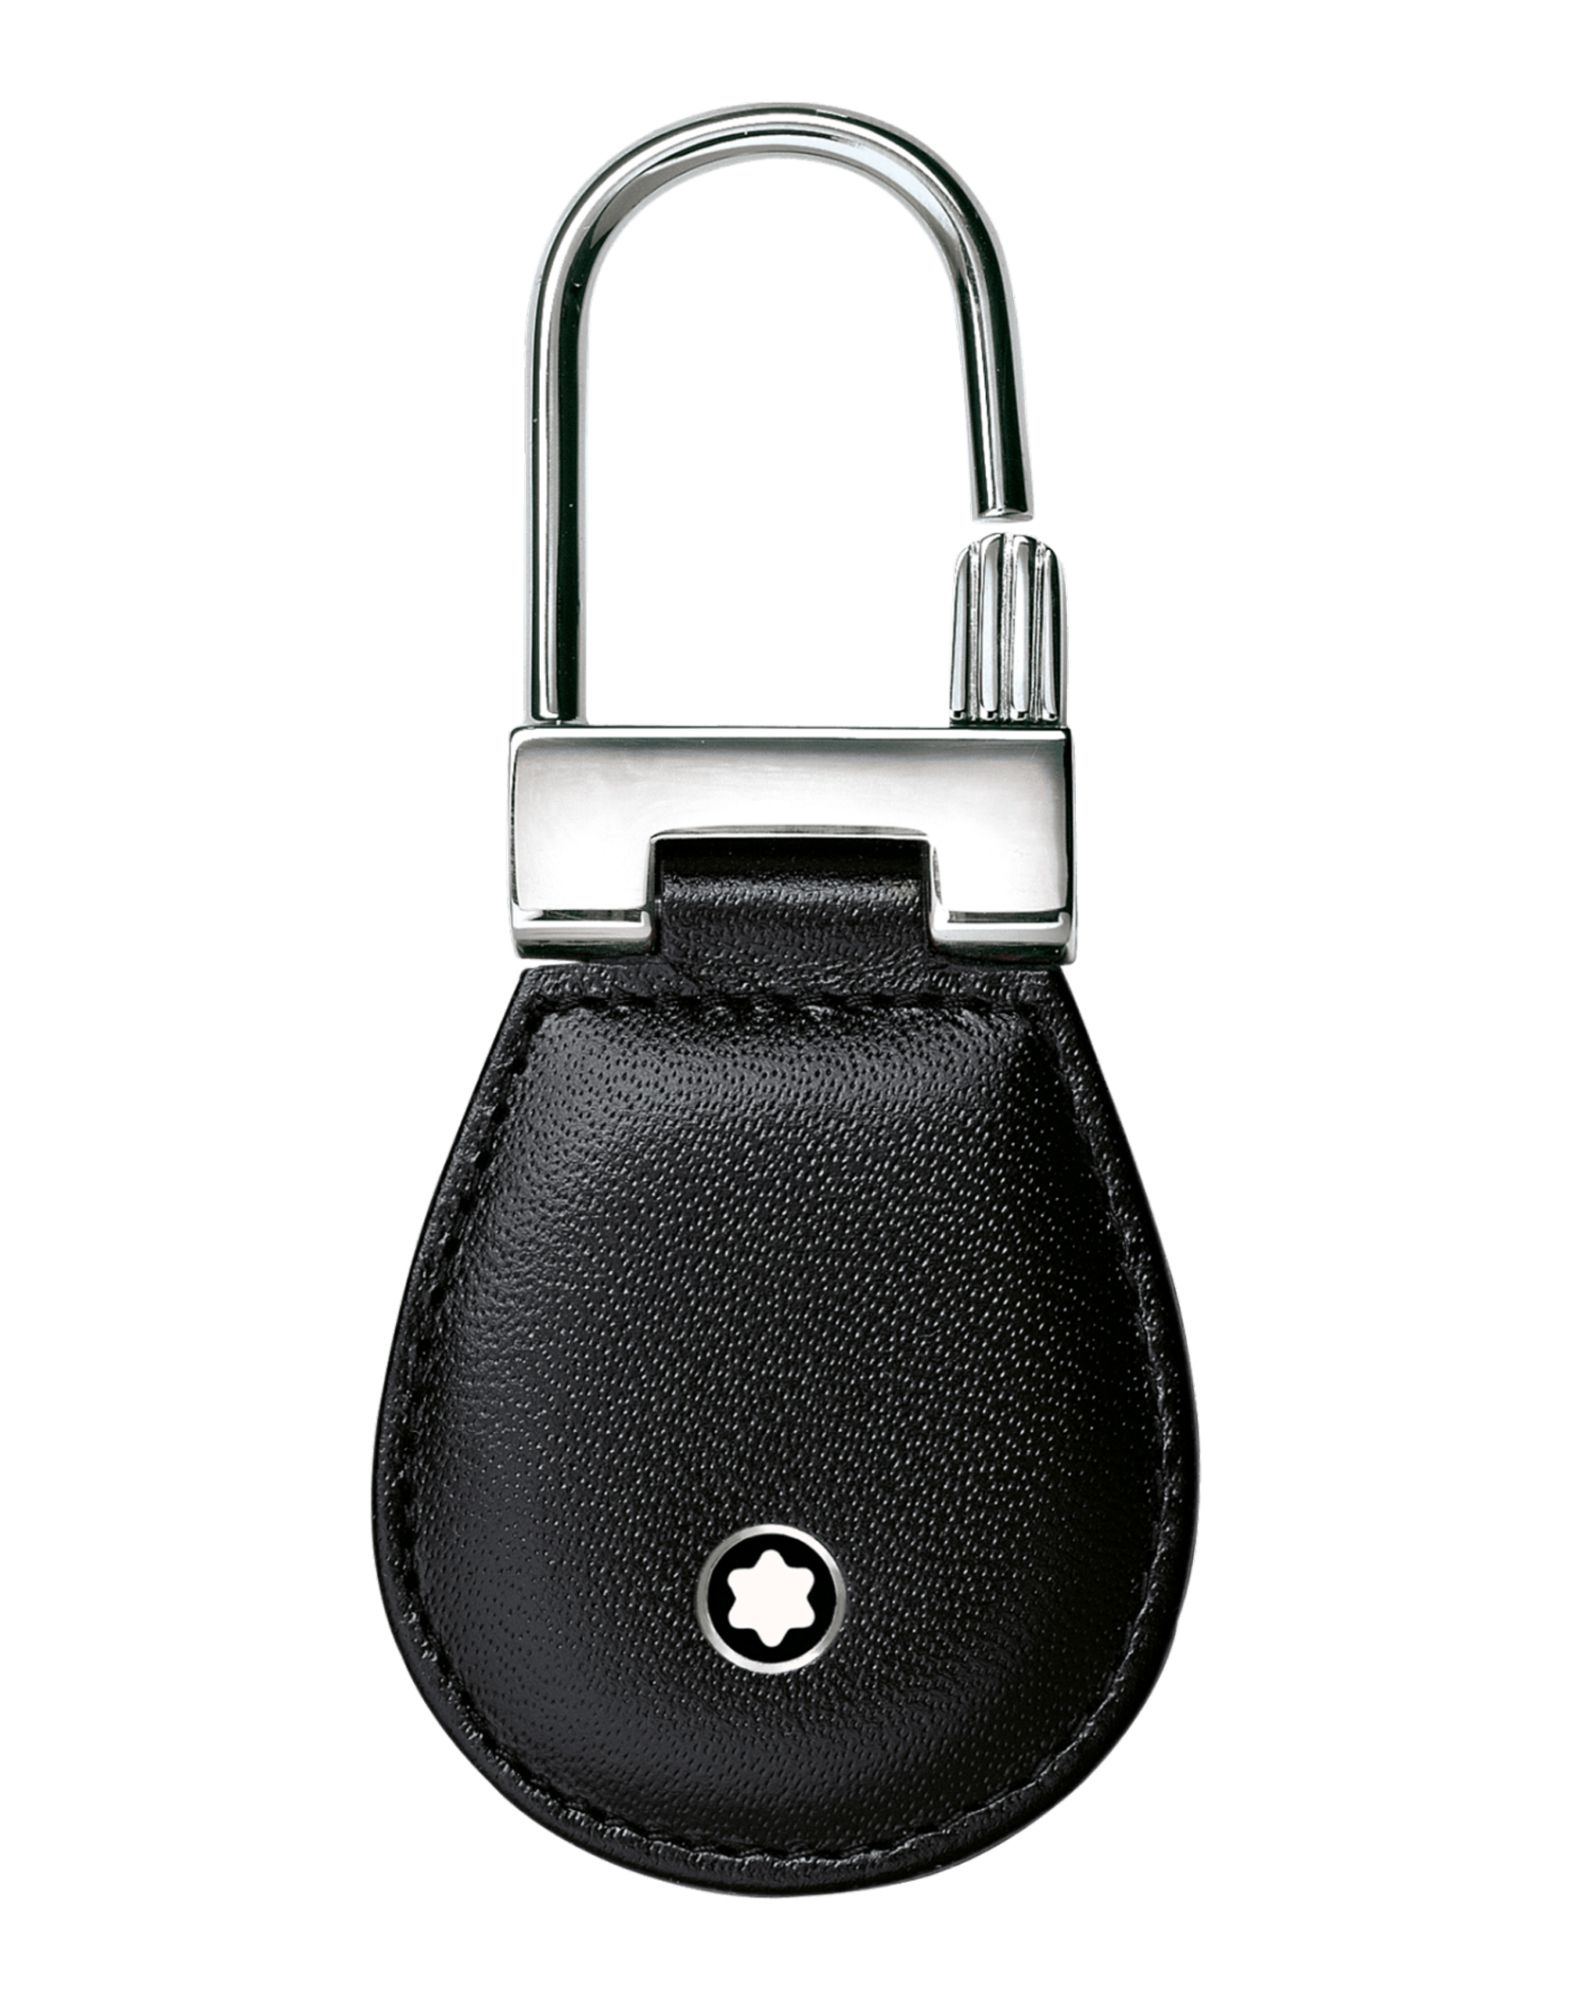 Portachiavi Montblanc Meisterstück Key Fob Black - Uomo - Acquista online su